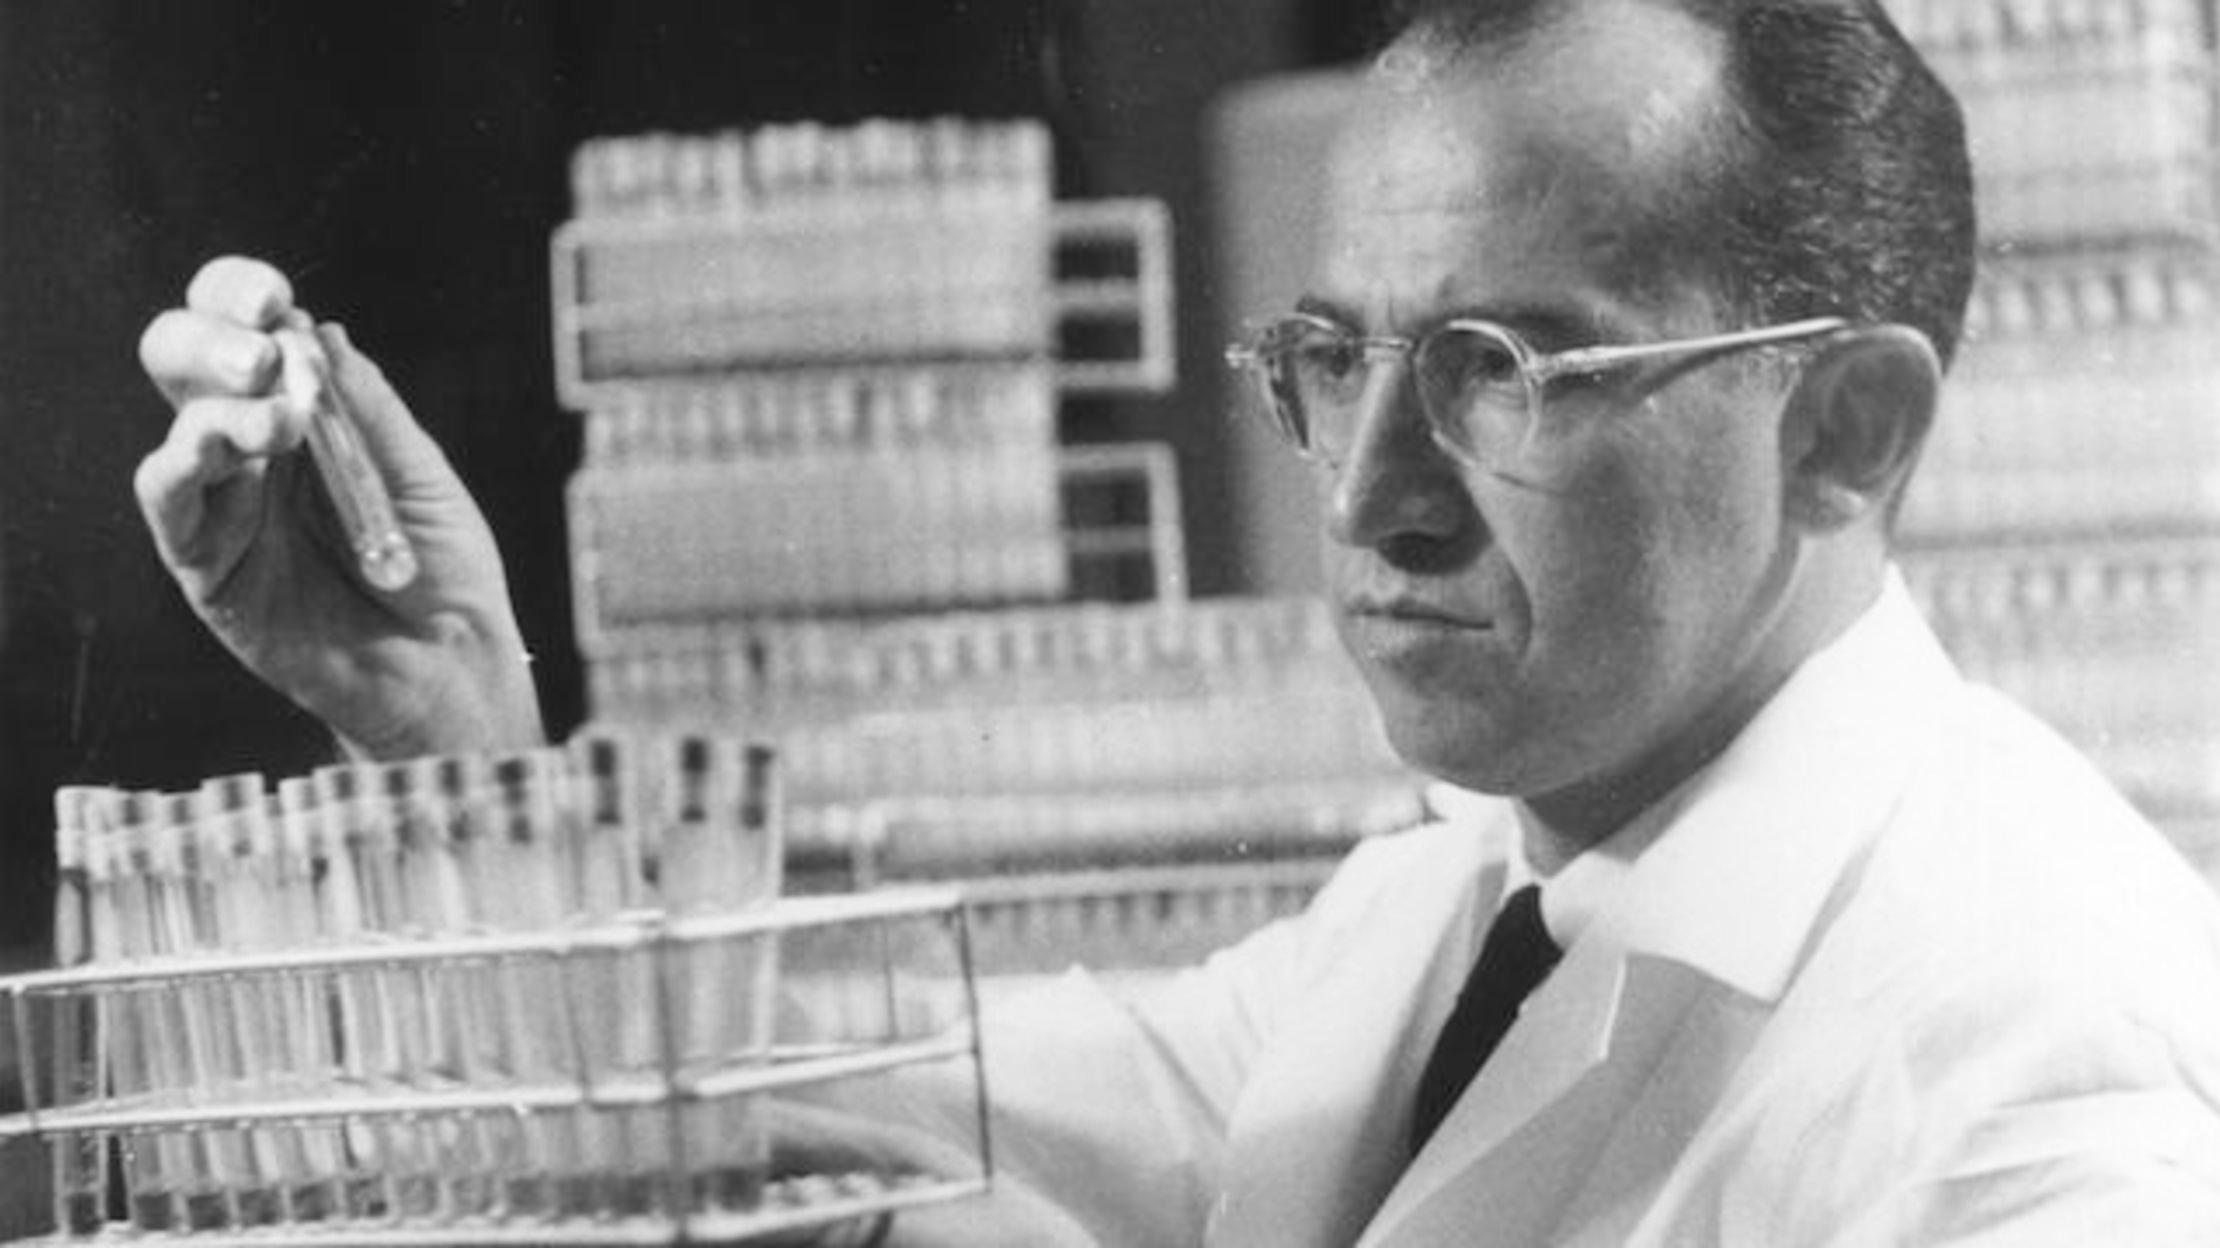 Nhà khoa học Jonas Salk. Ảnh: History.